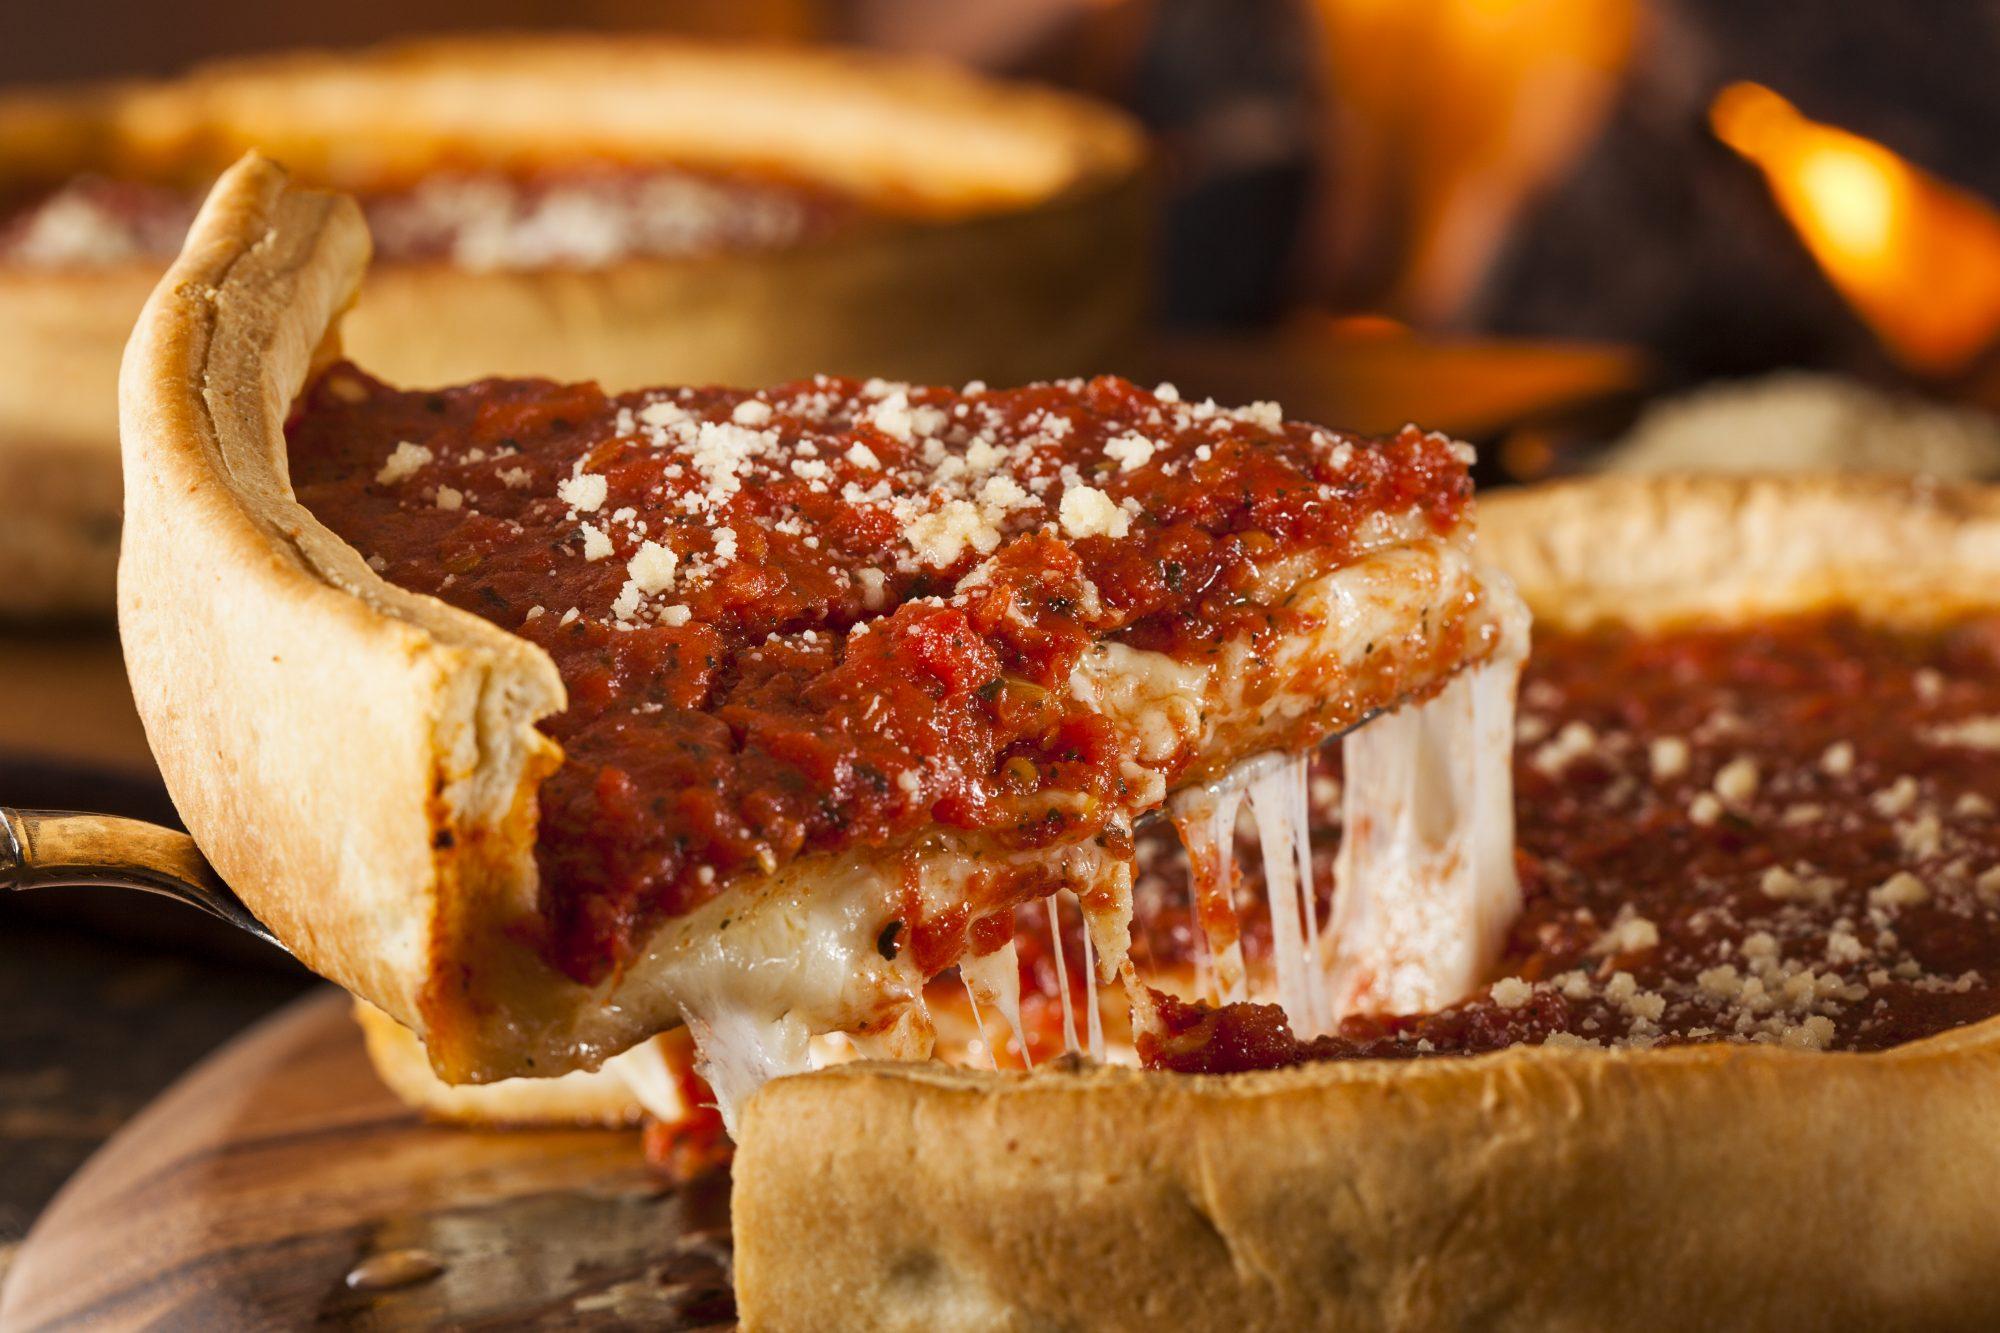 Chicago pizza Getty 3/6/20